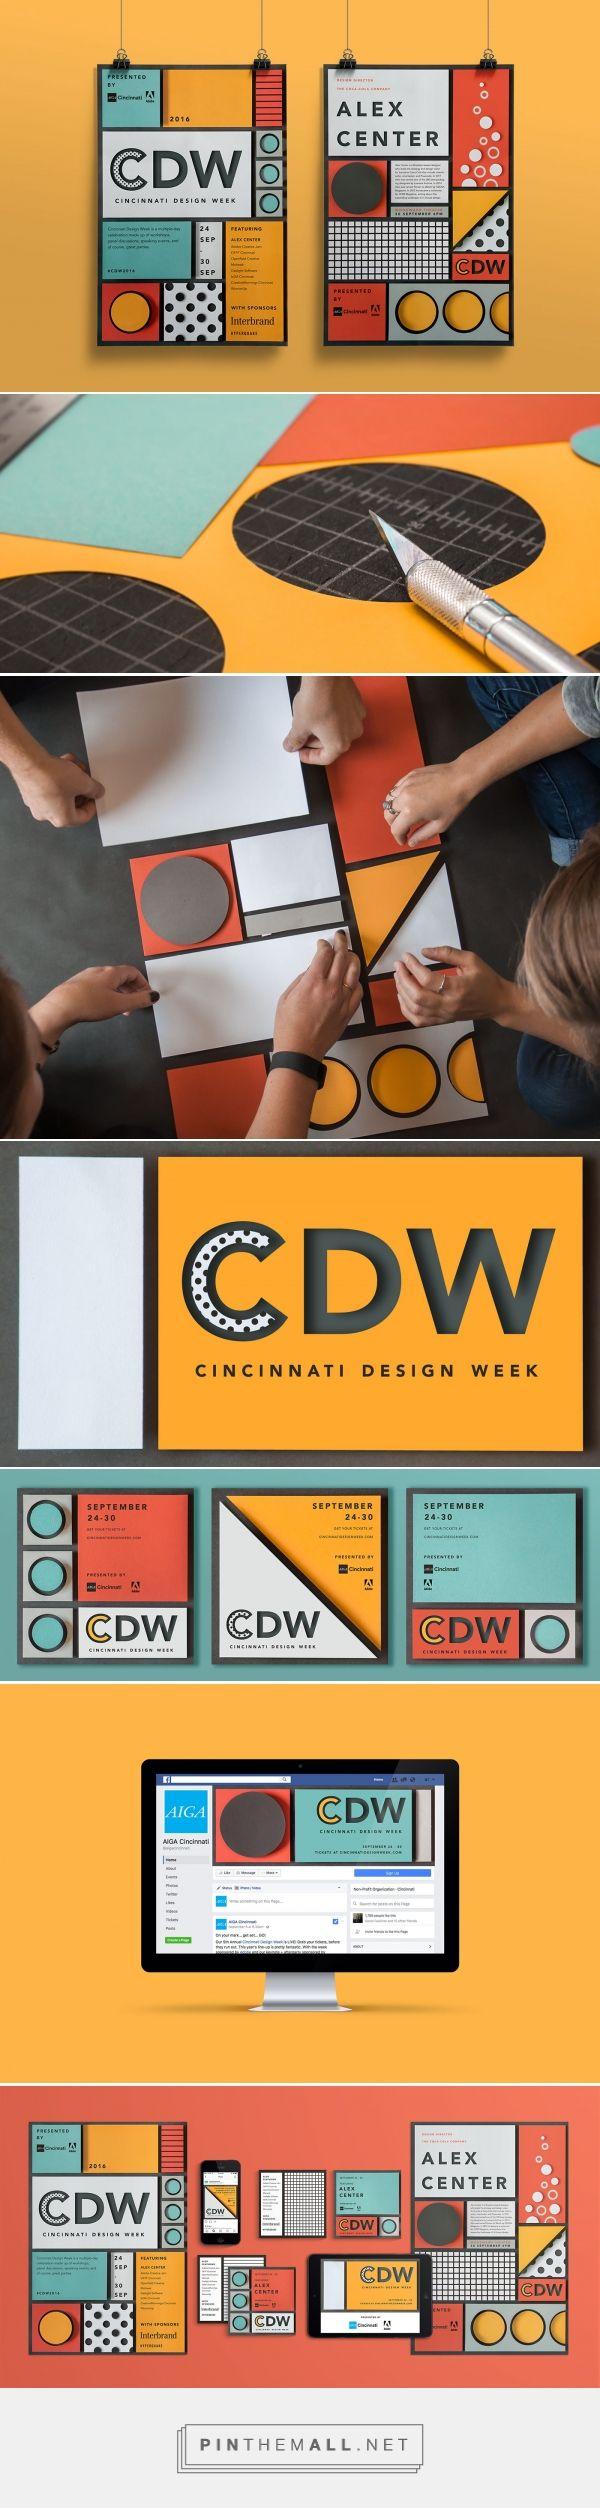 AIGA Cincinnati Design Week Branding by Hyperquake, LLC | Fivestar Branding Agency – Design and Branding Agency & Curated Inspiration Gallery